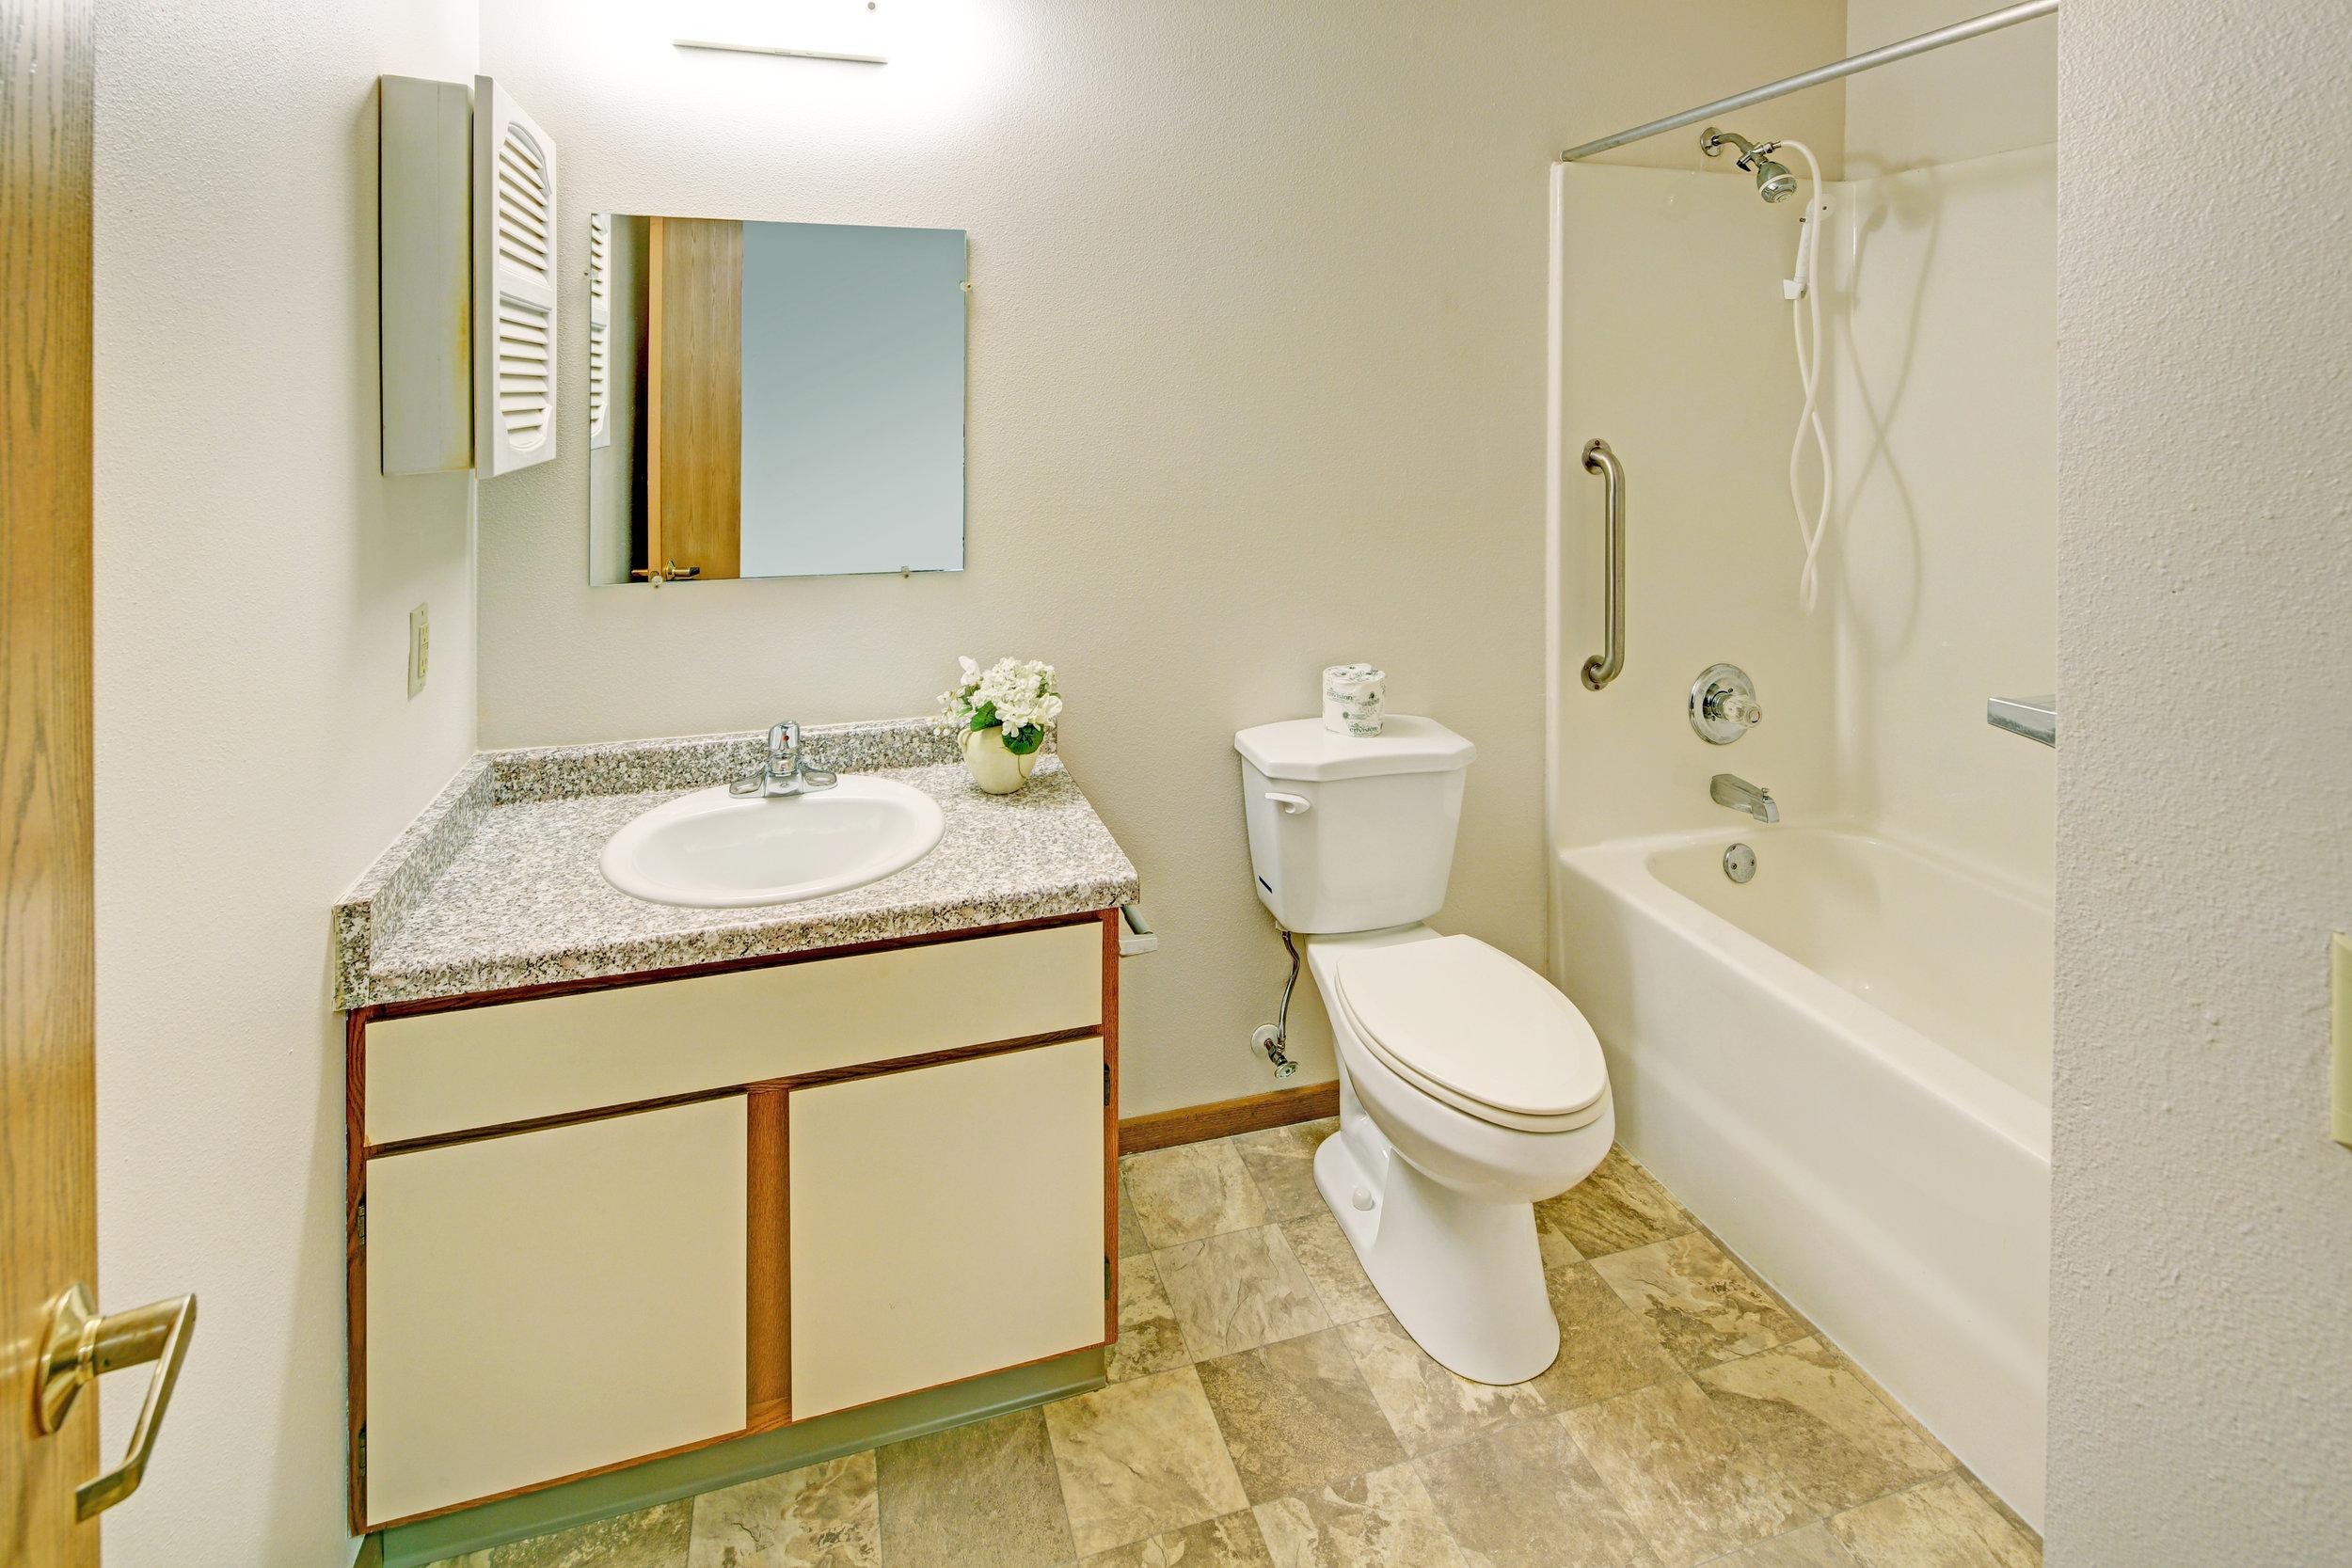 BreezewdII Bathroom.jpg